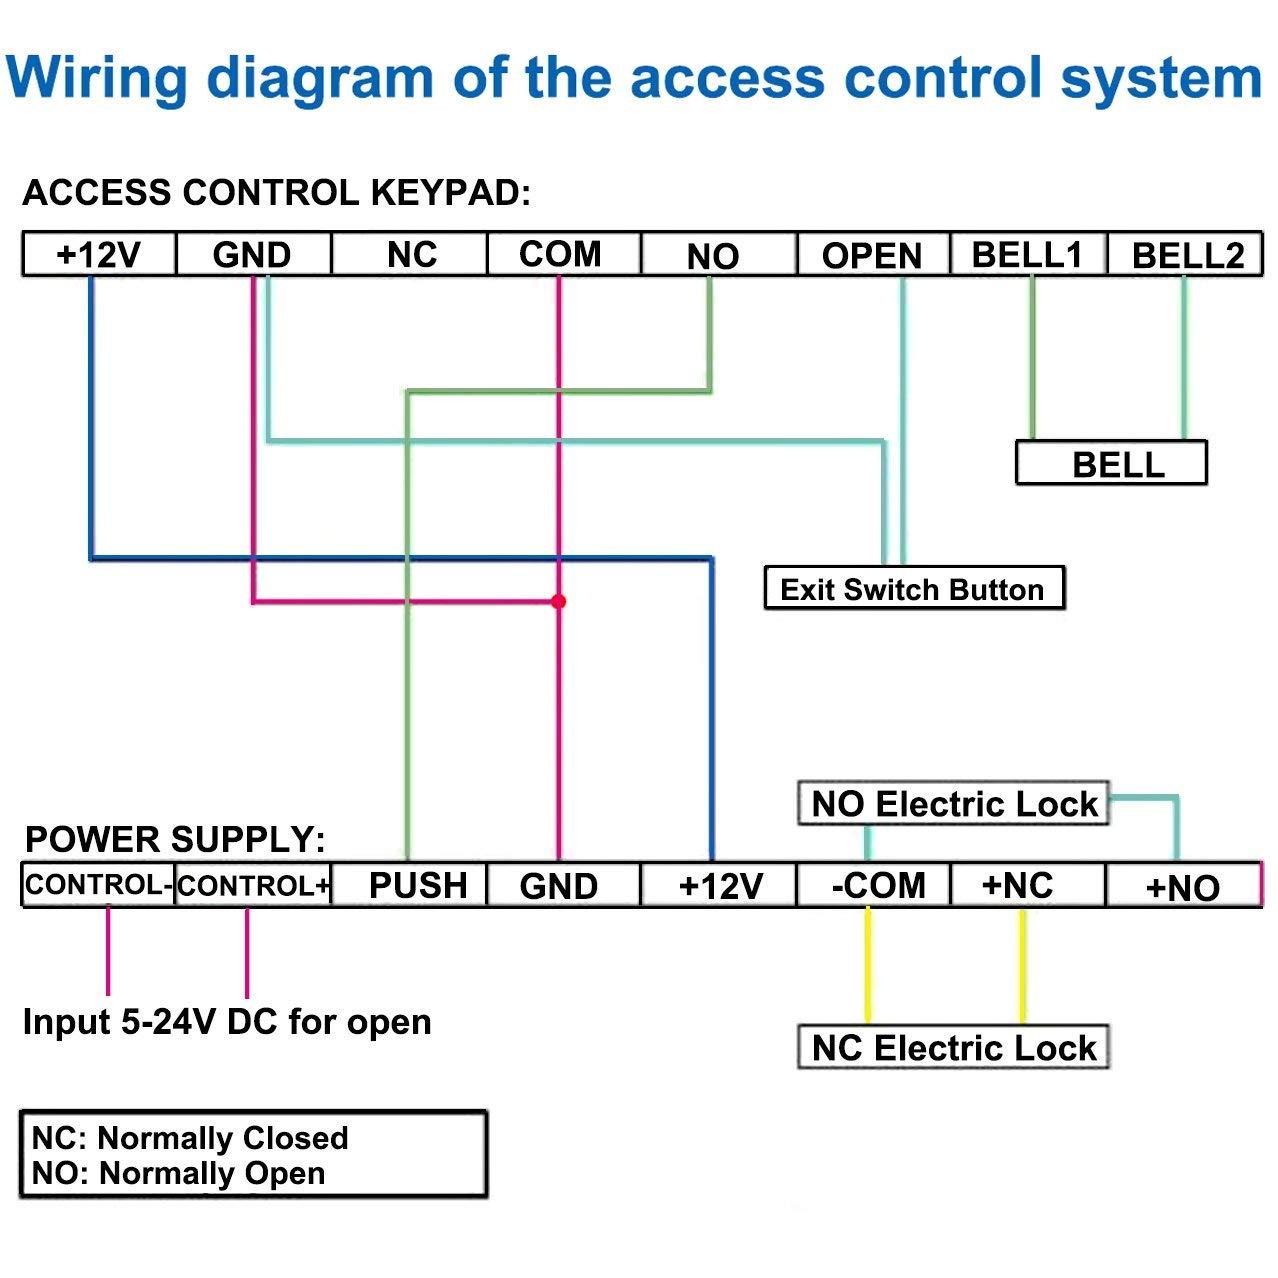 Strike Wiring Diagram Powersupplyandelectricstrikewiringdiagram